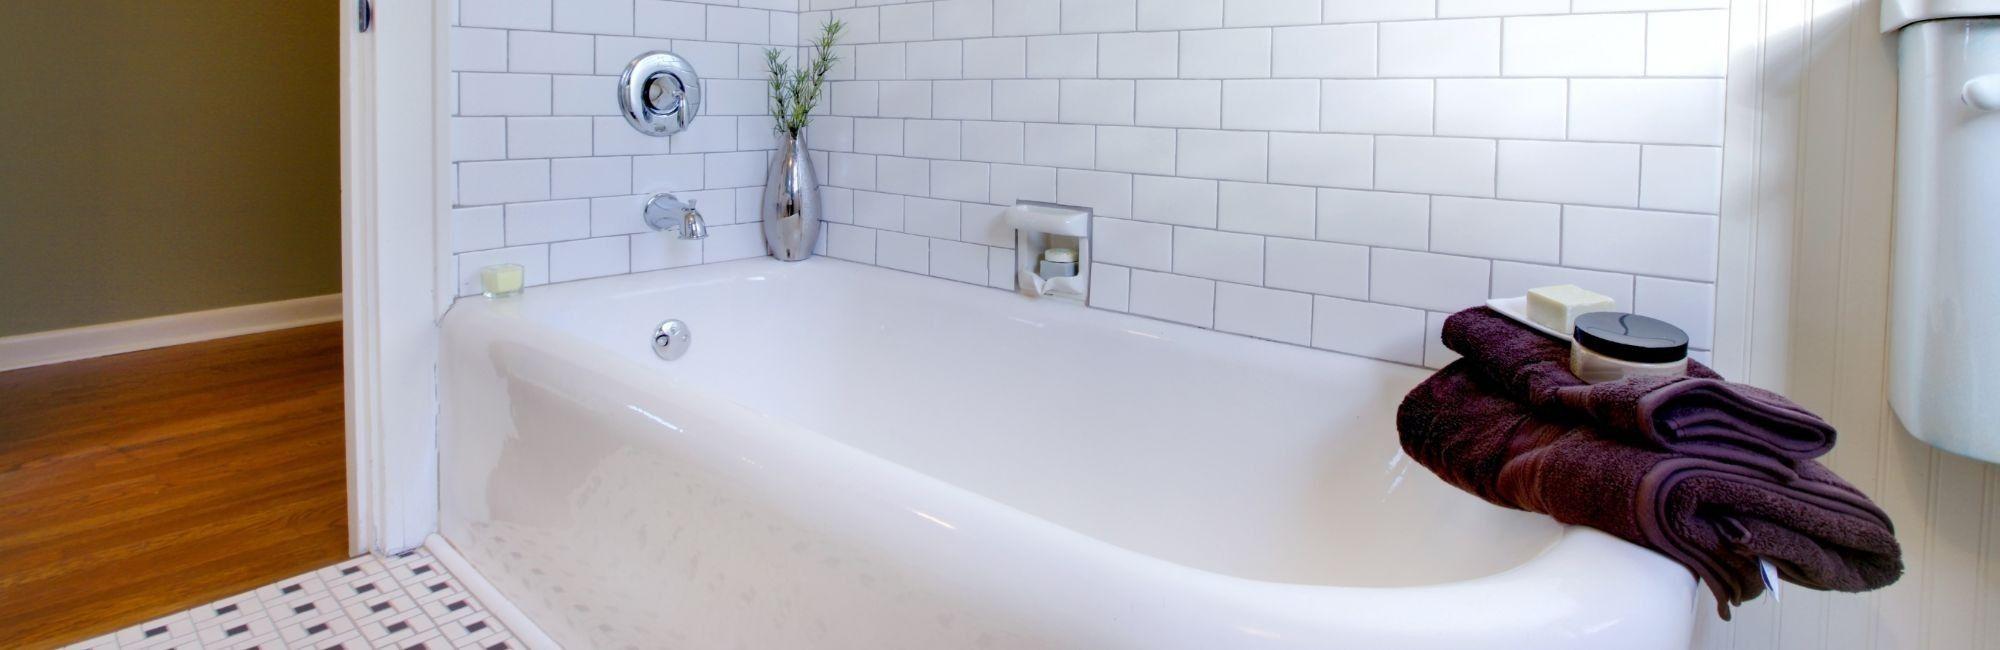 Bathtub reglazing http://www.bathtubrefinishingschool.com Avondale ...